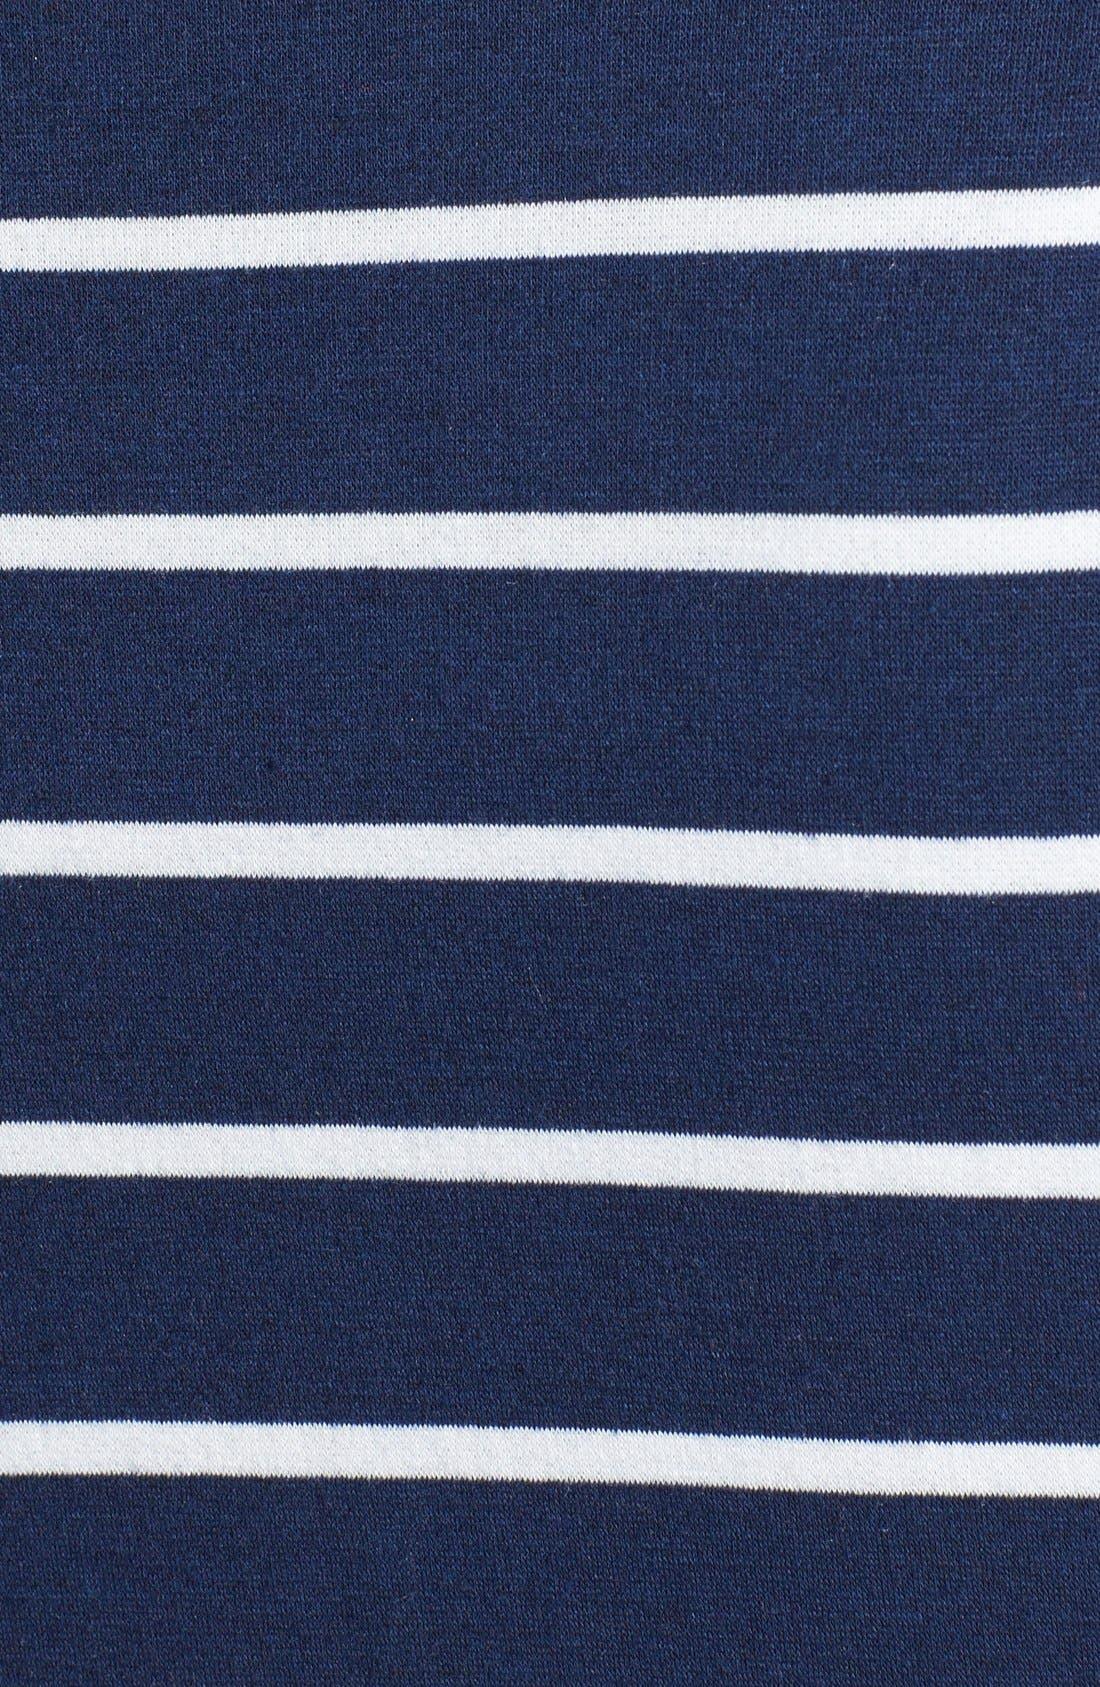 Stripe Fleece Wrap,                             Alternate thumbnail 9, color,